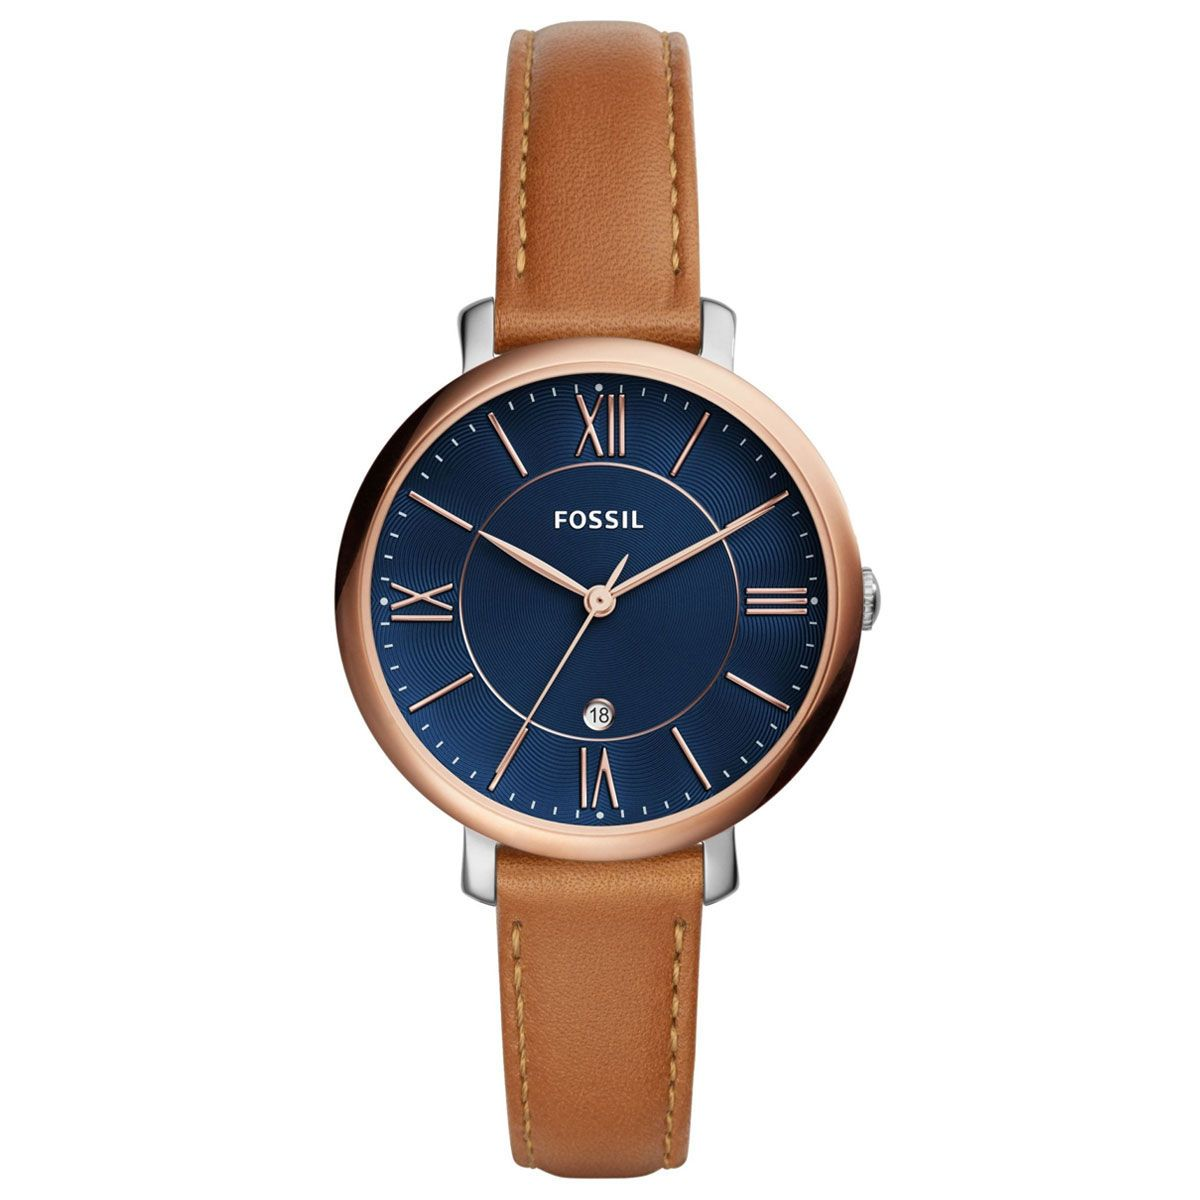 Fossil Fes4274 Bayan Kol Saati Saat Ve Saat Deri Saat Bayan Saatleri Deri